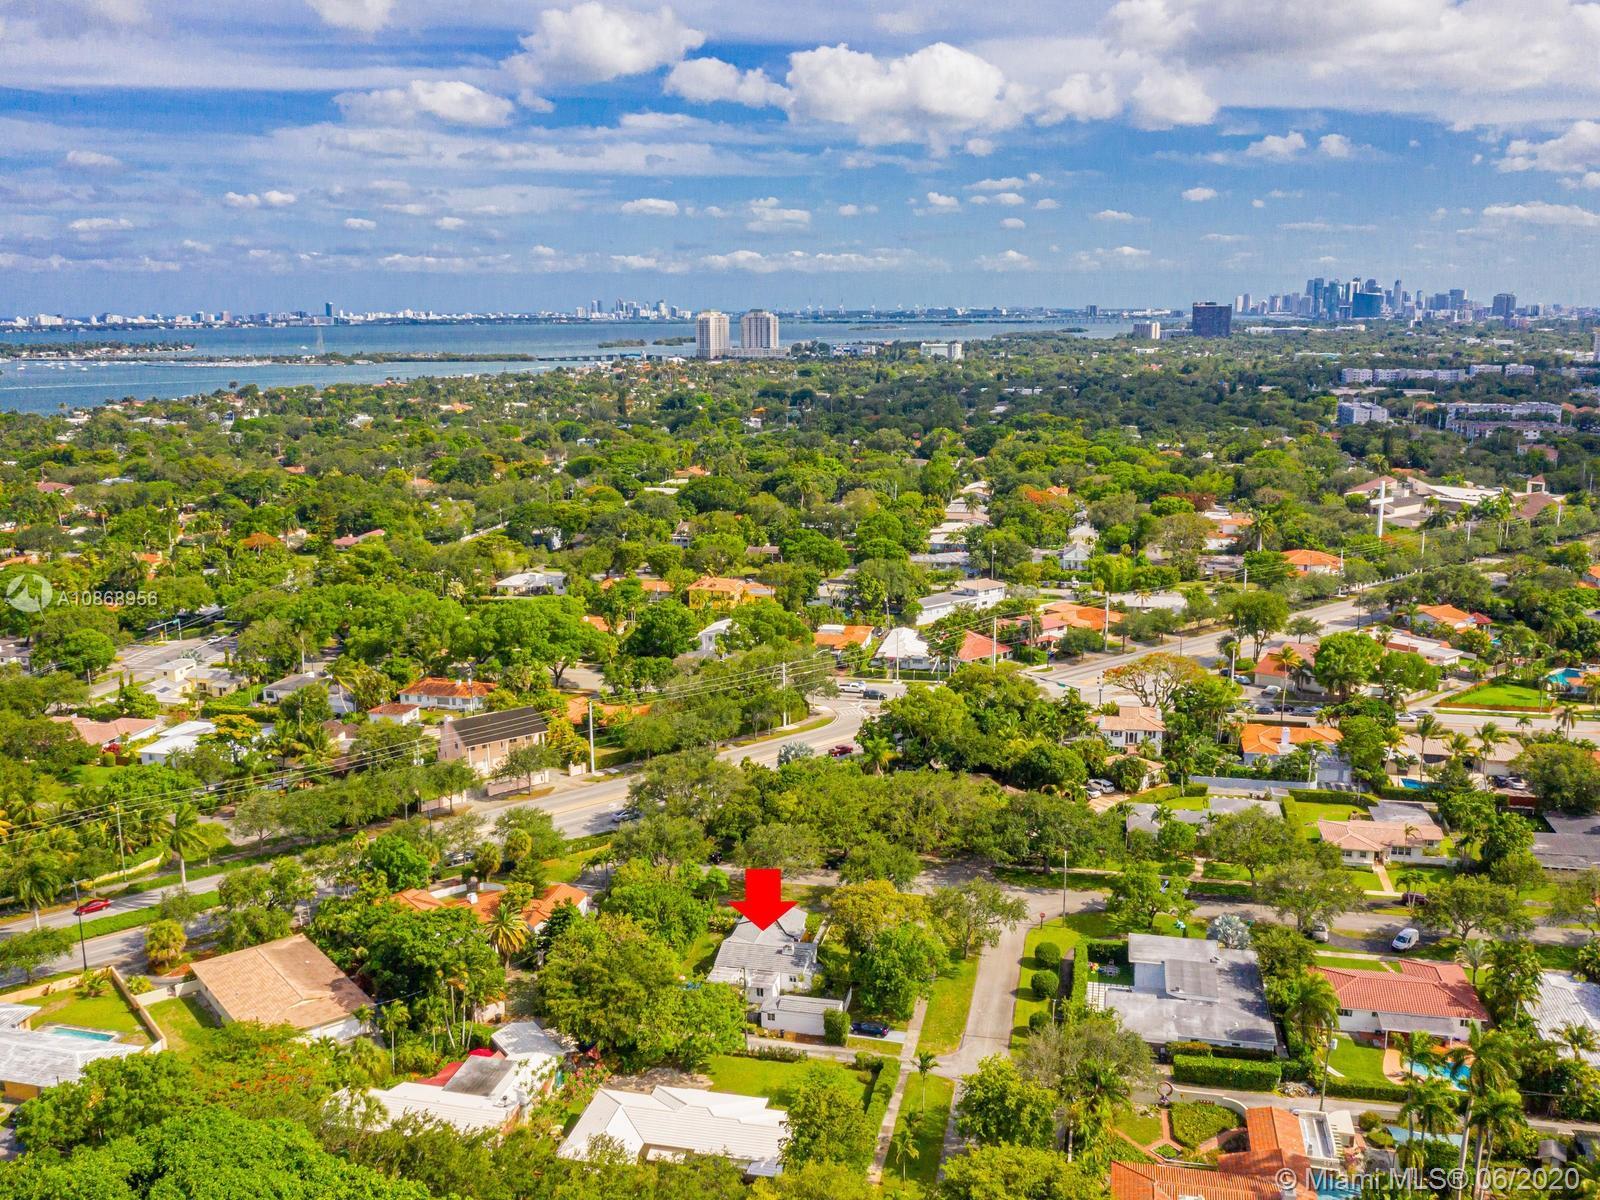 Miami Shores # - 27 - photo